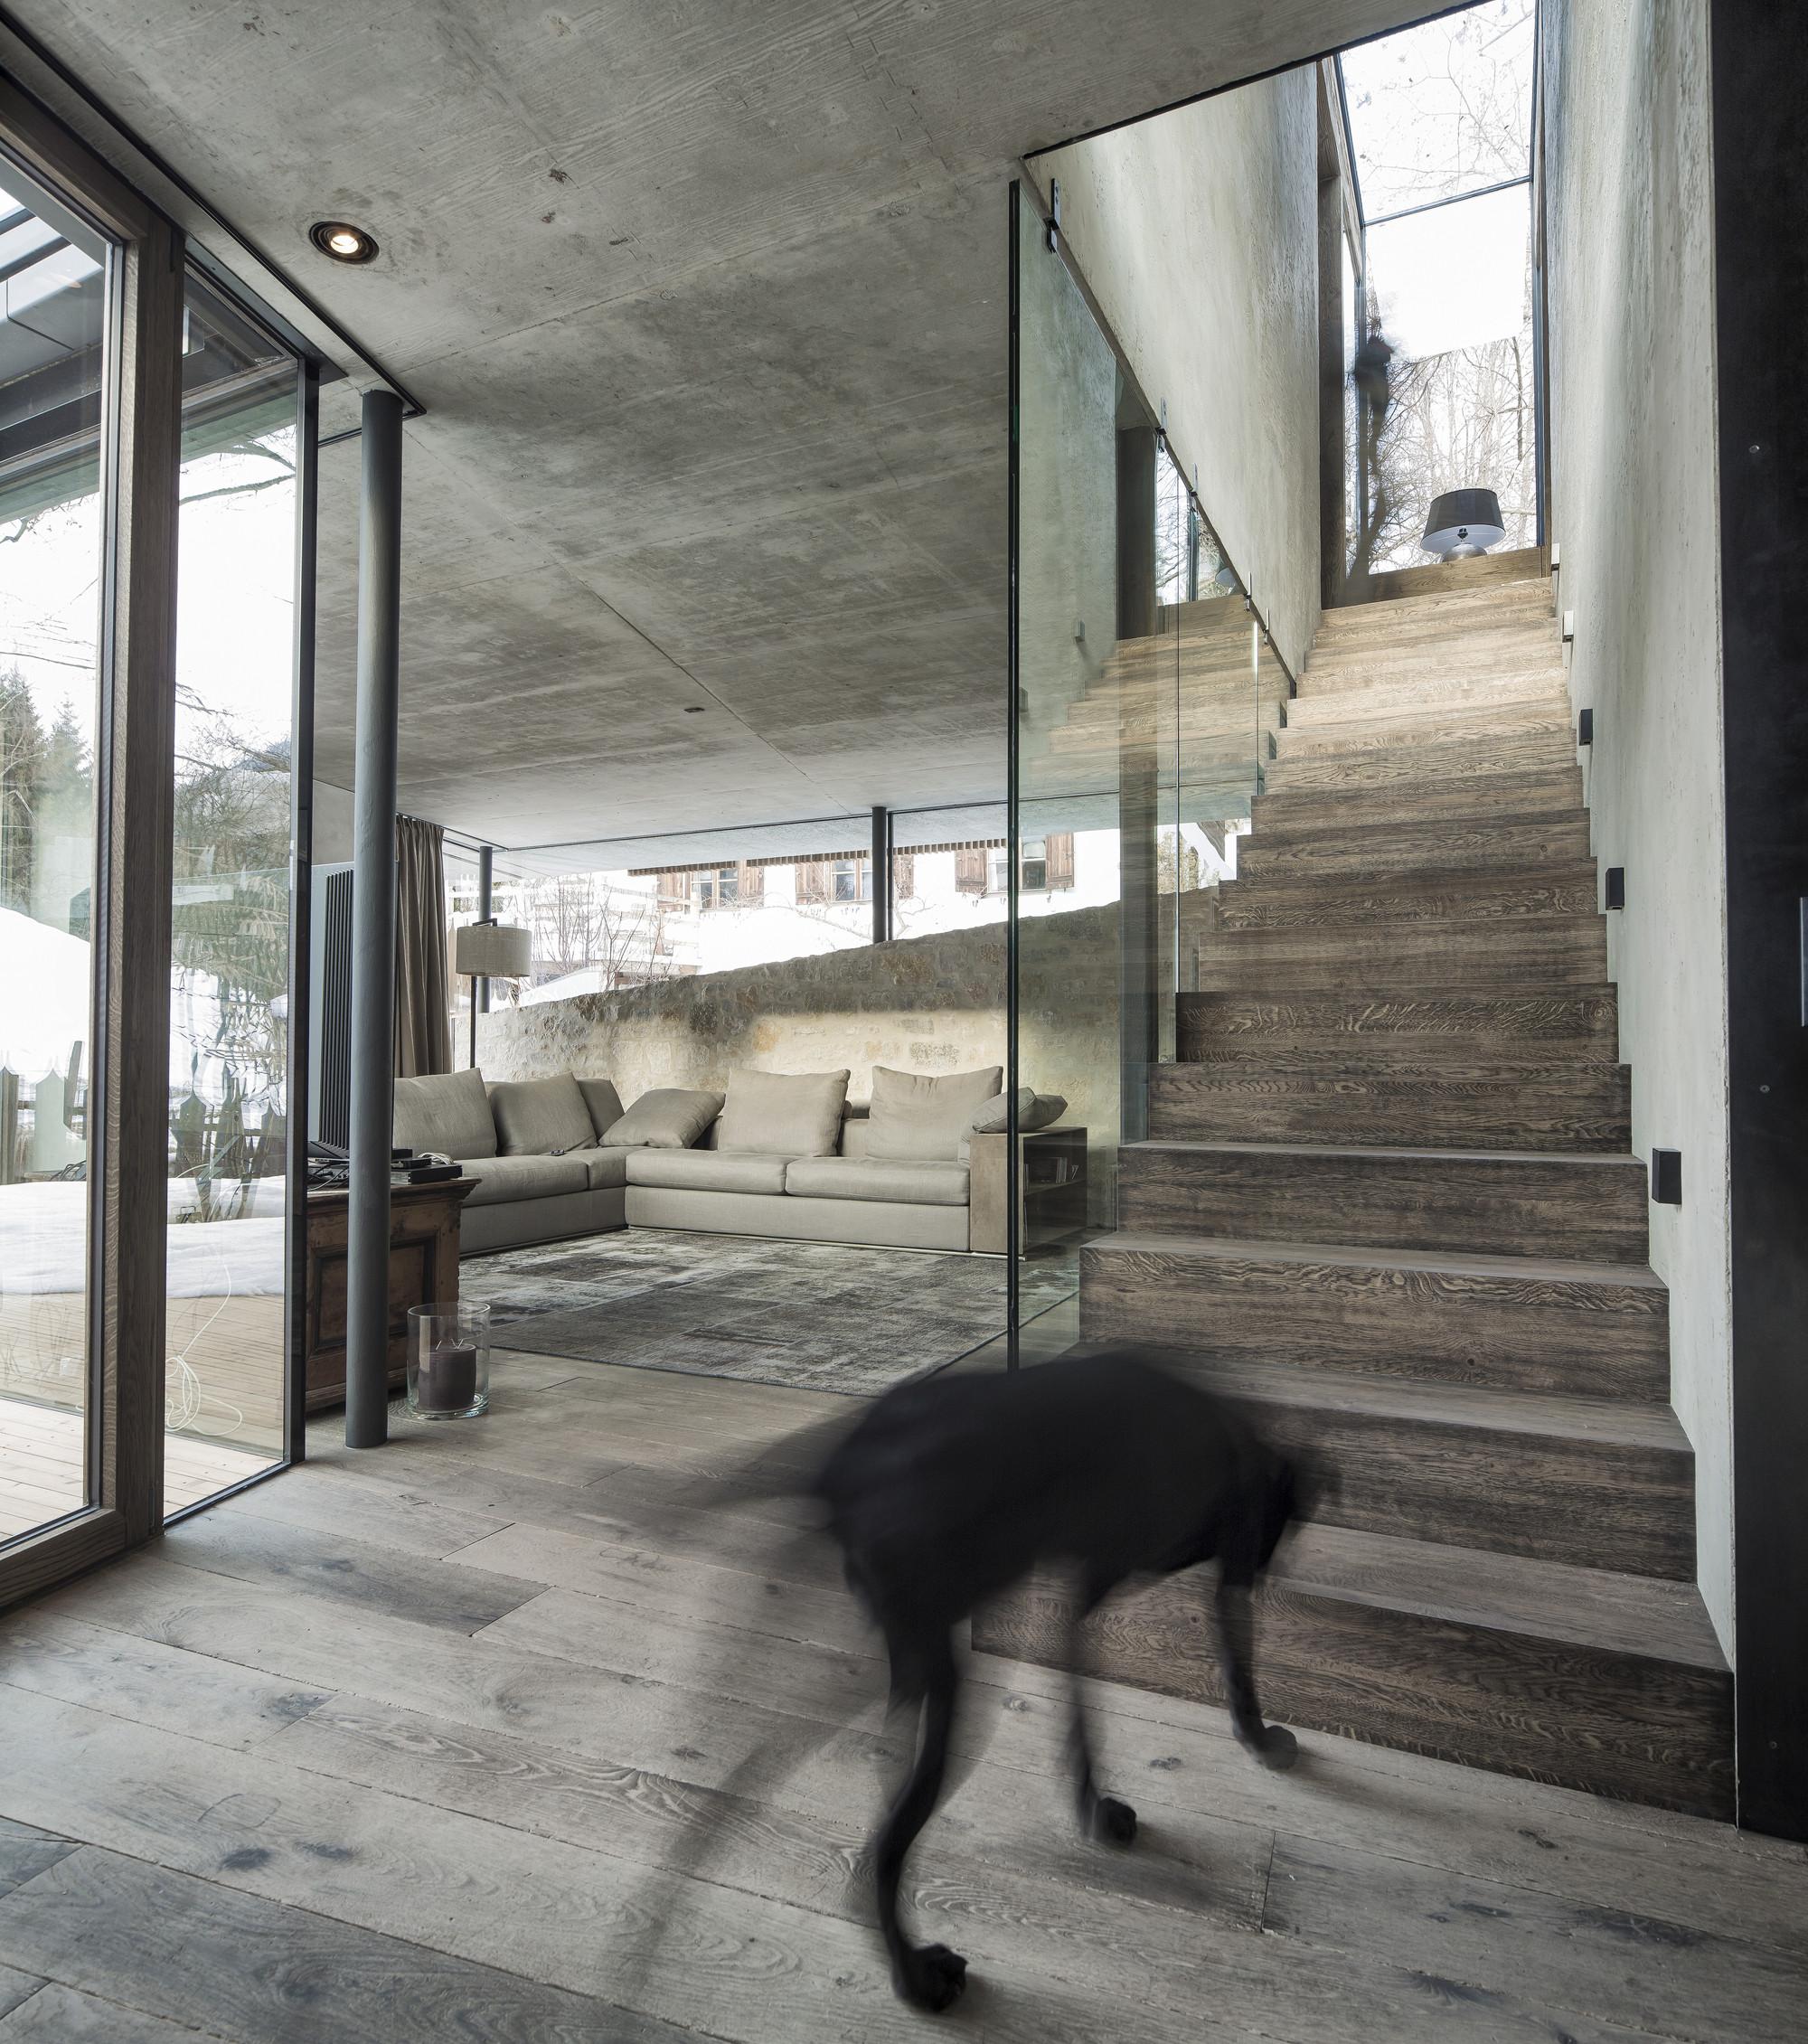 gallery of haus walde gogl architekten 11. Black Bedroom Furniture Sets. Home Design Ideas